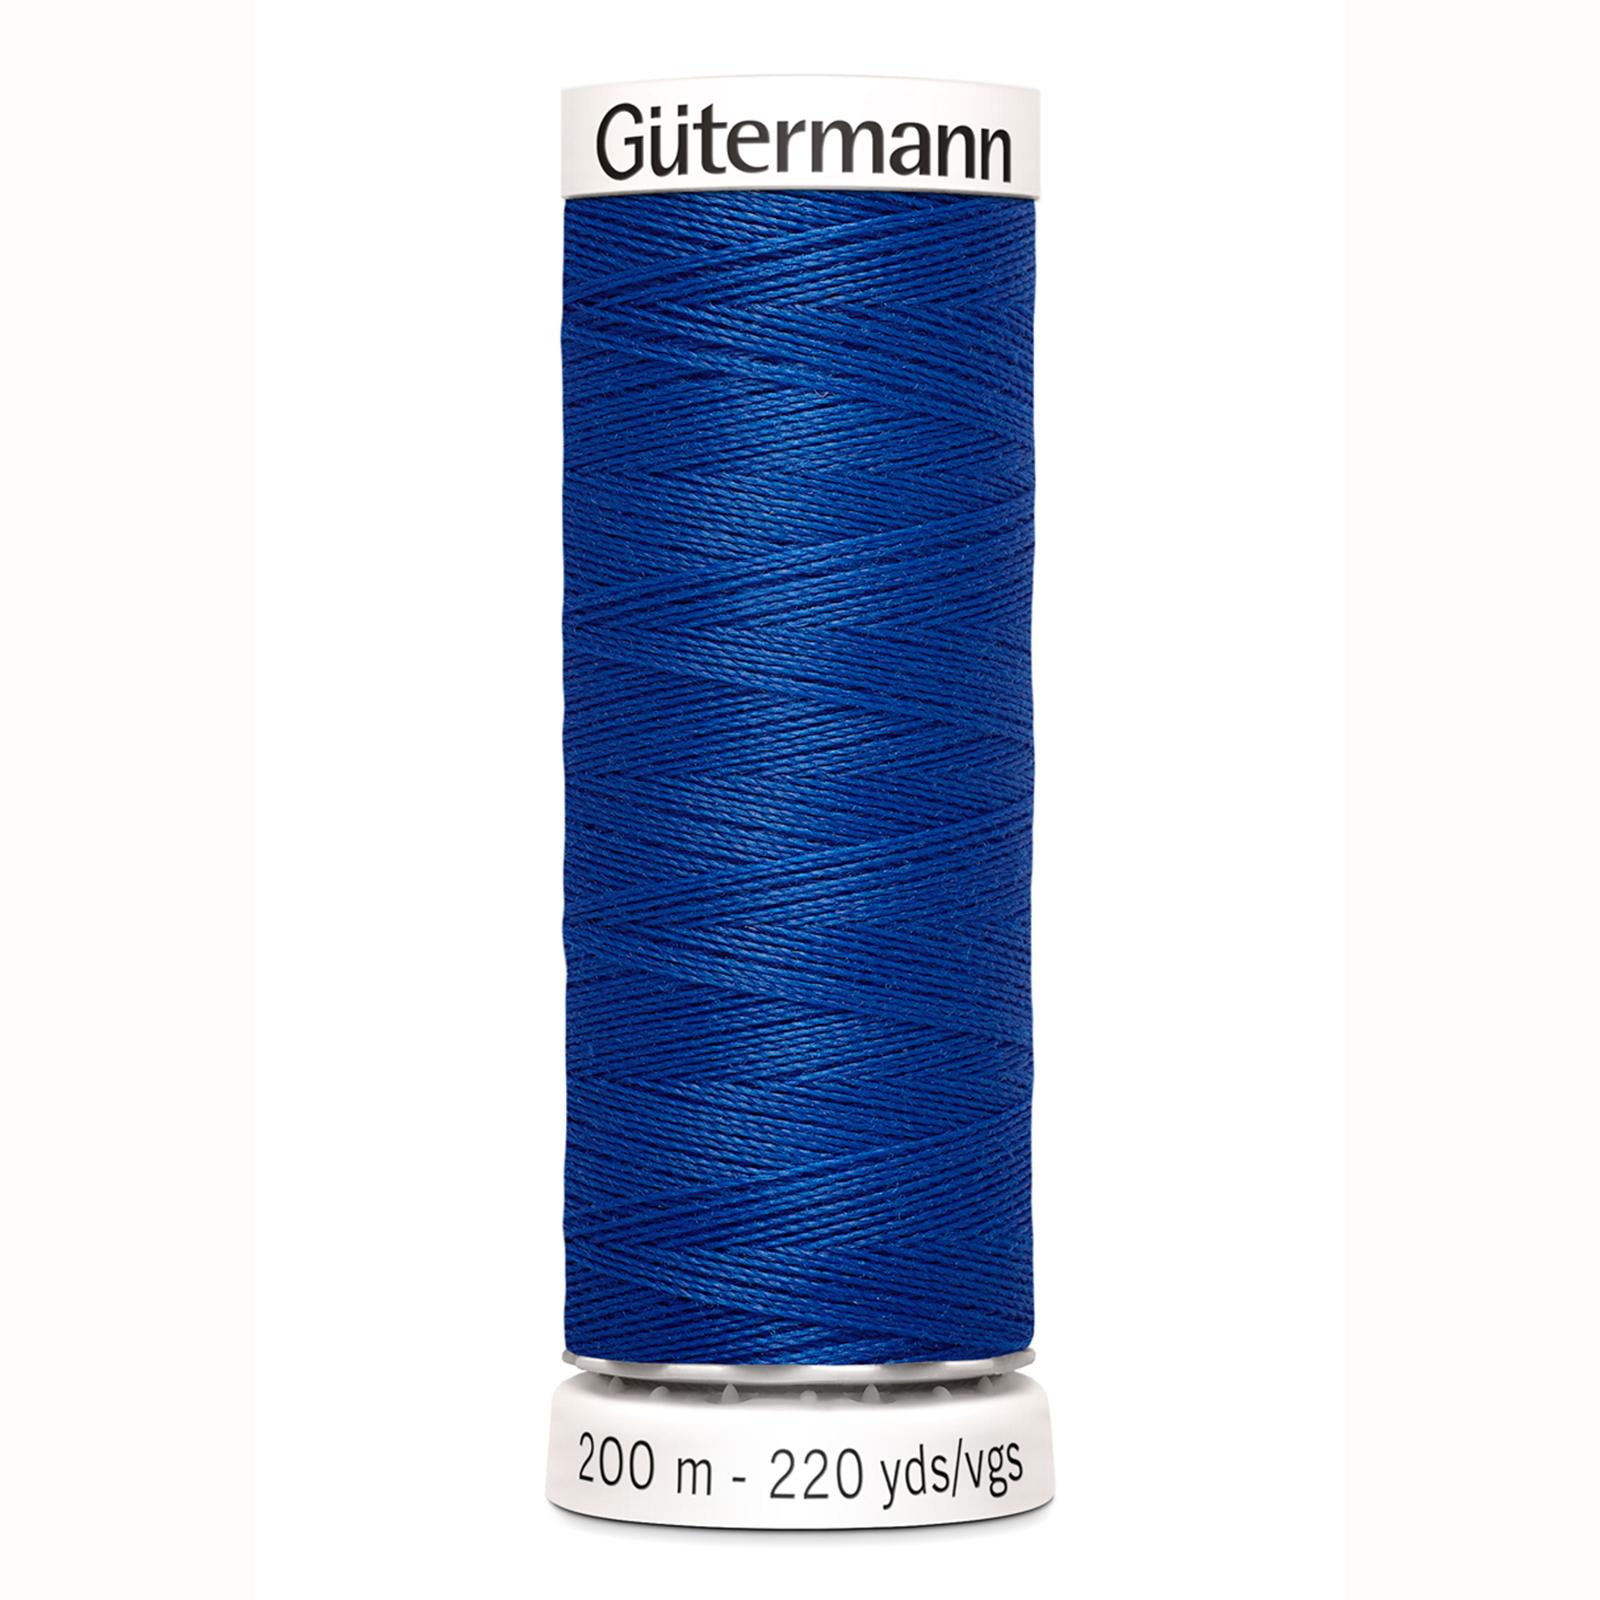 Gutermann Polyestr 200m-316